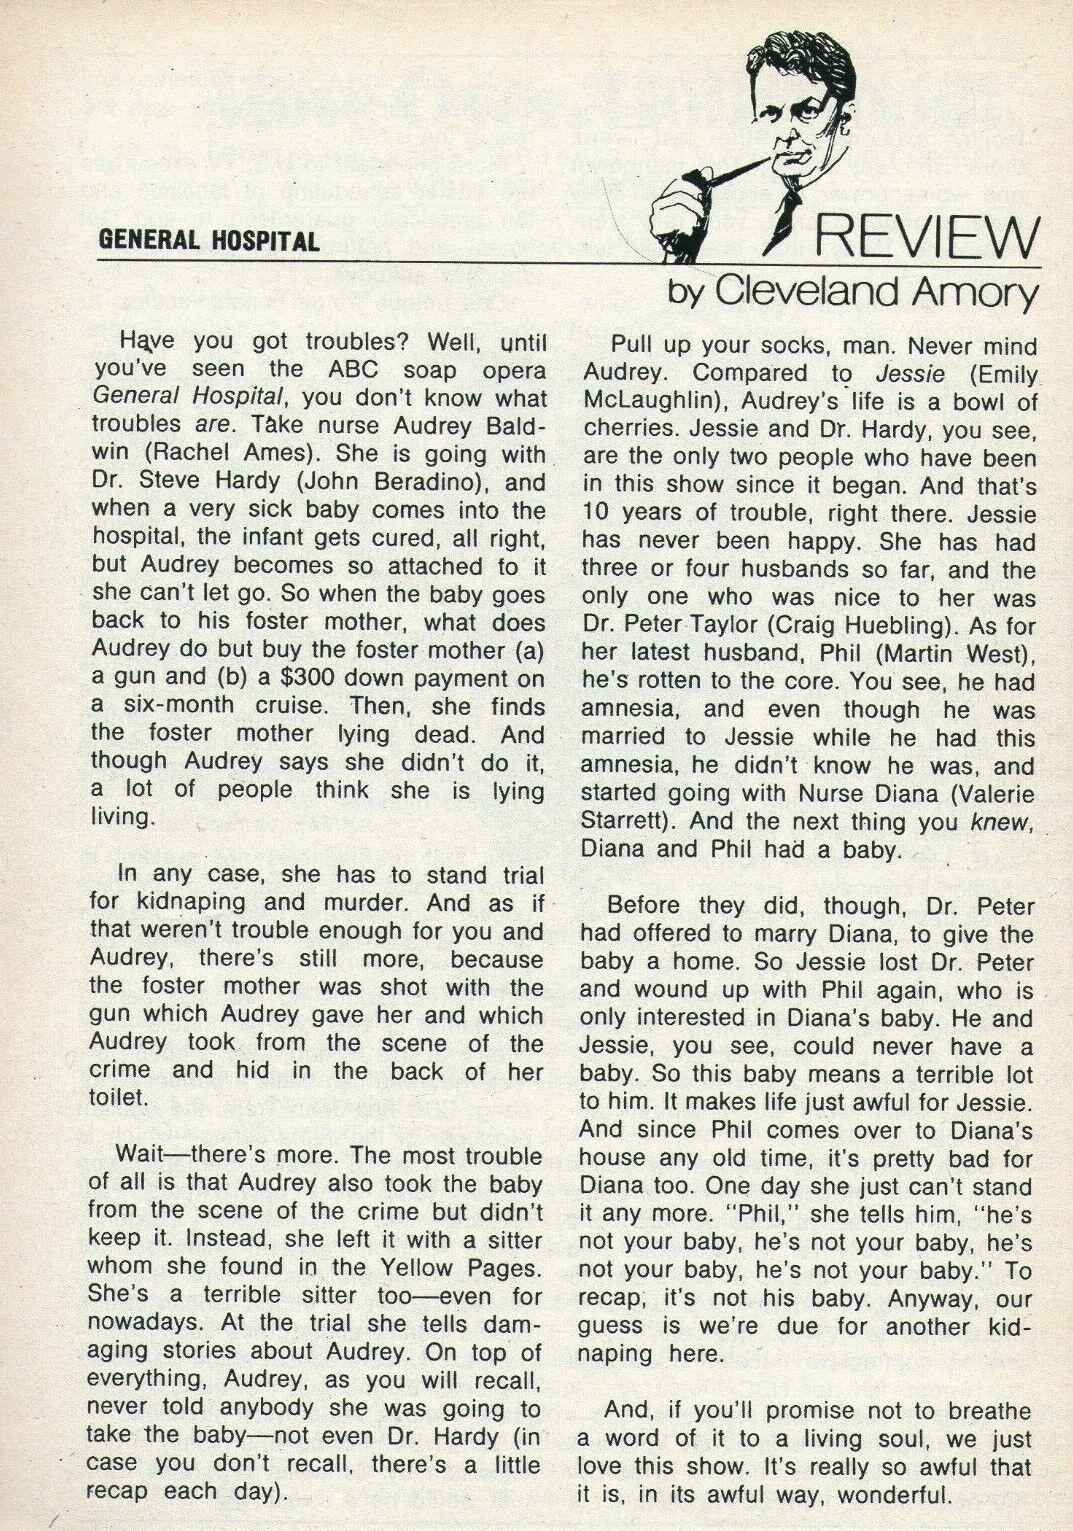 Image 1 - 1972 TV GUIDE ARTICLE~GENERAL HOSPITAL SOAP OPERA REVIEW~Rachel Ames